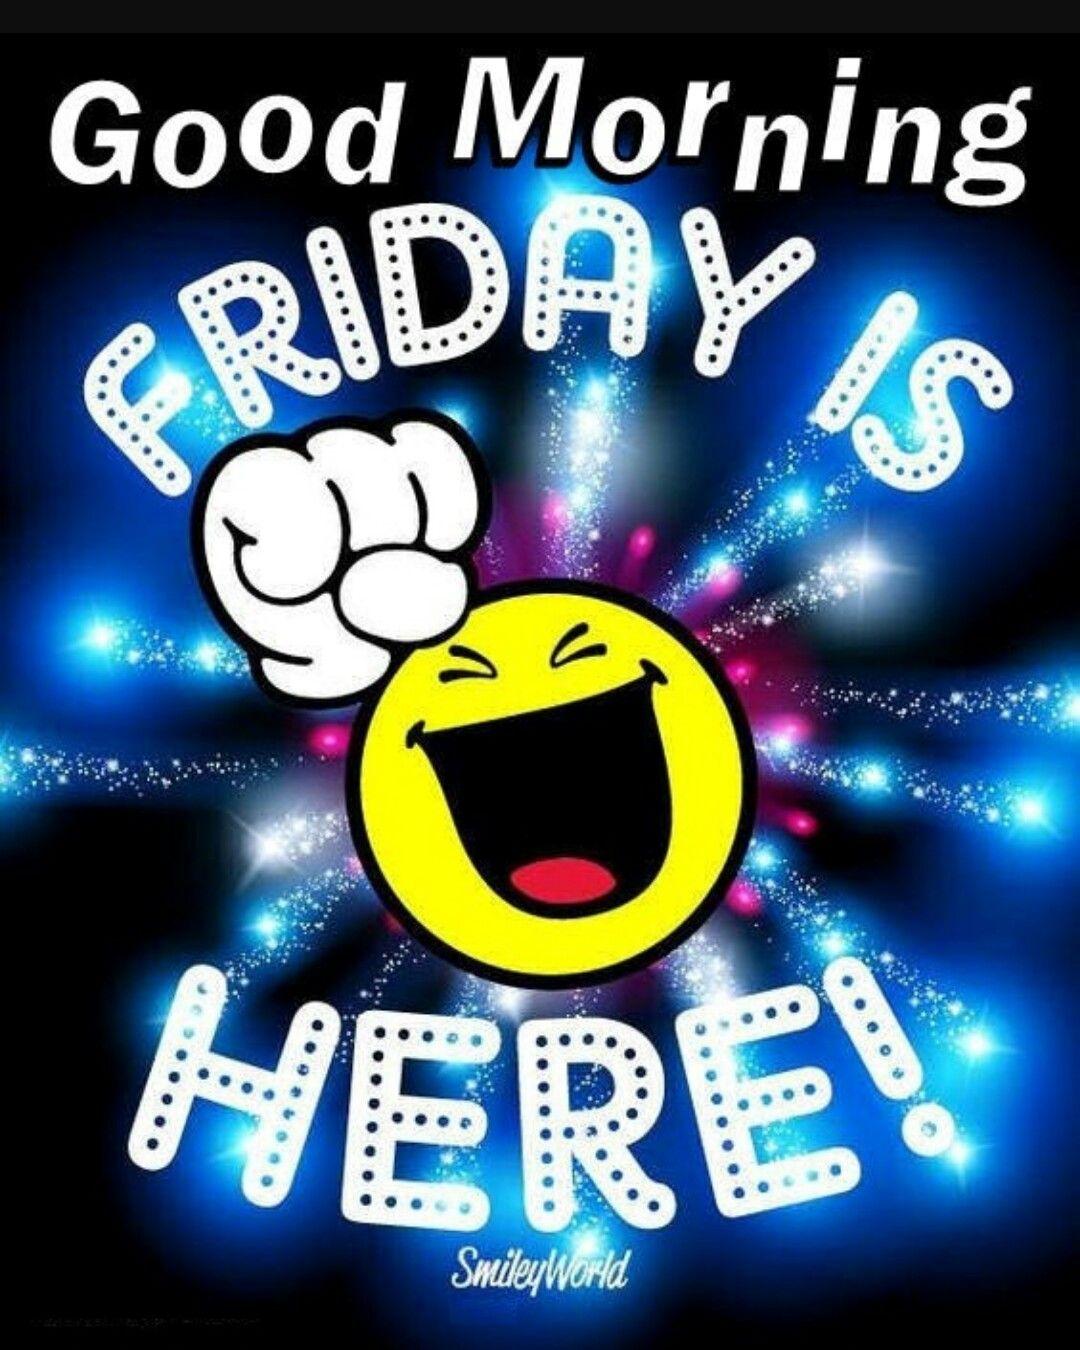 Fantastic Friday Quotes: Good Morning World ... Have A Fantastic Friday